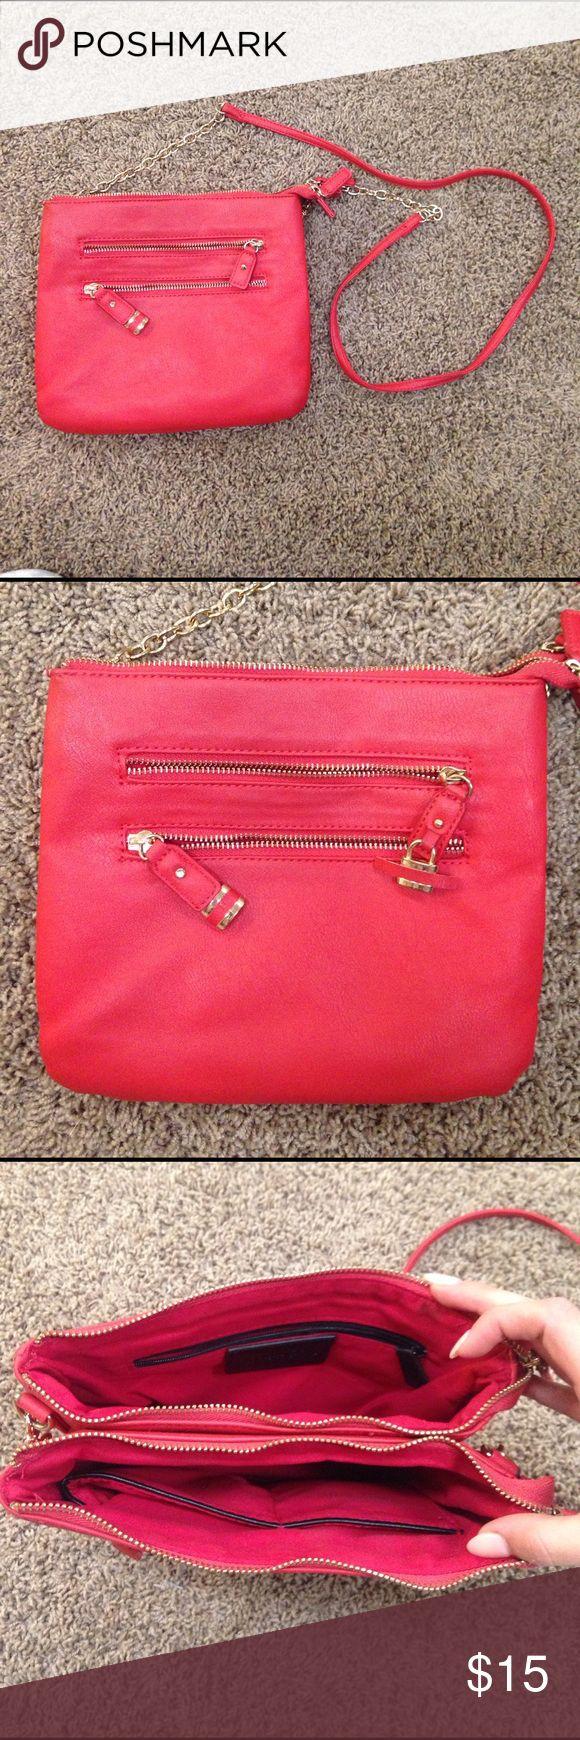 Women's Crossbody Bag Red. Lots of pockets! Charming Charlie. Charming Charlie Bags Crossbody Bags